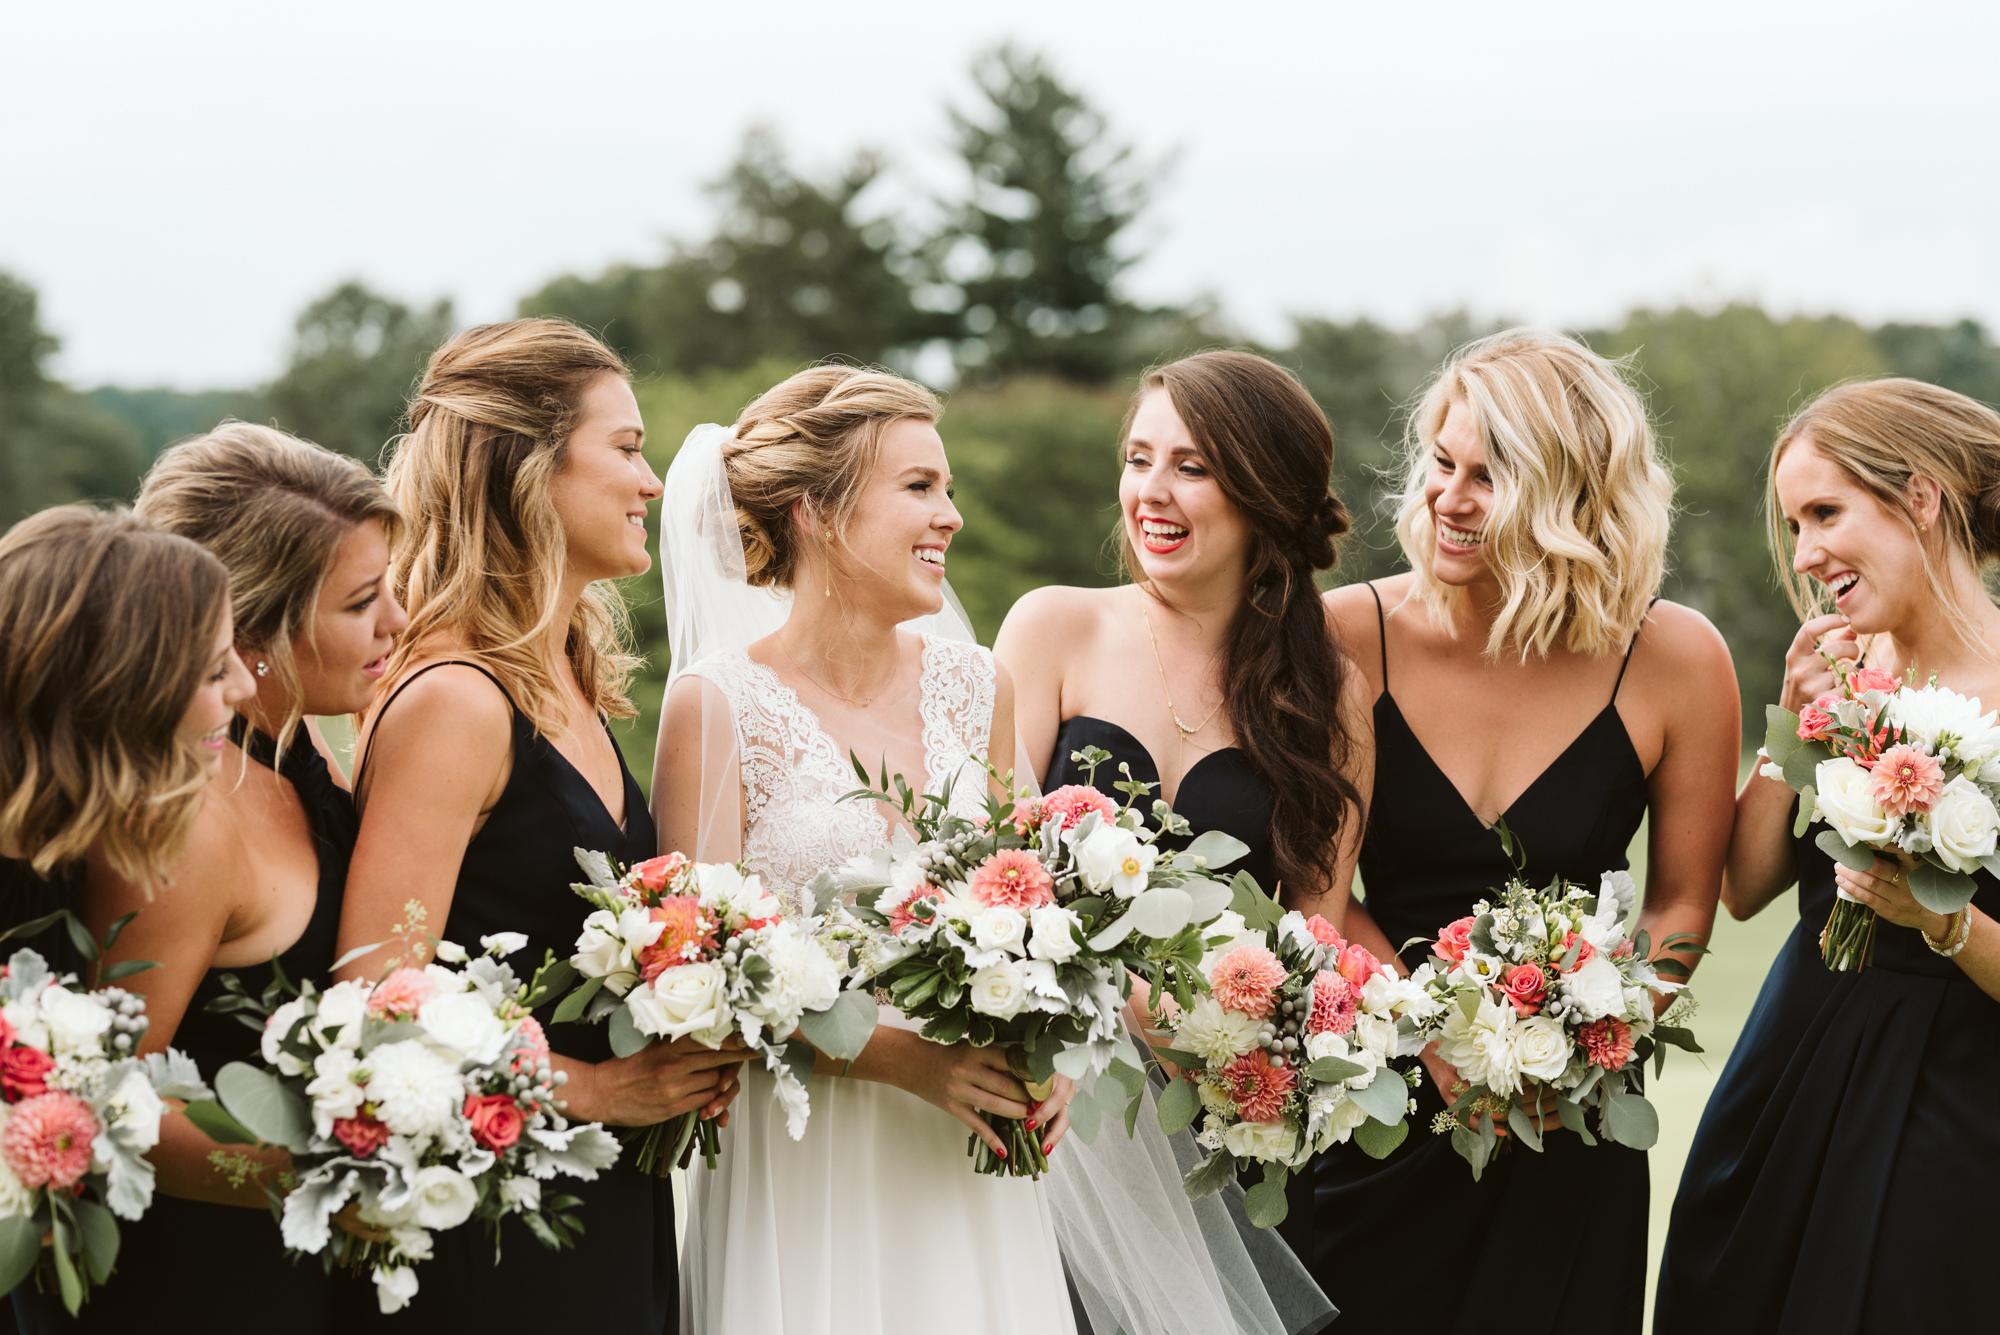 Elegant, Columbia Country Club, Chevy Chase Maryland, Baltimore Wedding Photographer, Classic, Traditional, Jewish Wedding, Bride with Bridesmaids, BHLDN Wedding Dress, Shona Joy Bridesmaid Dresses